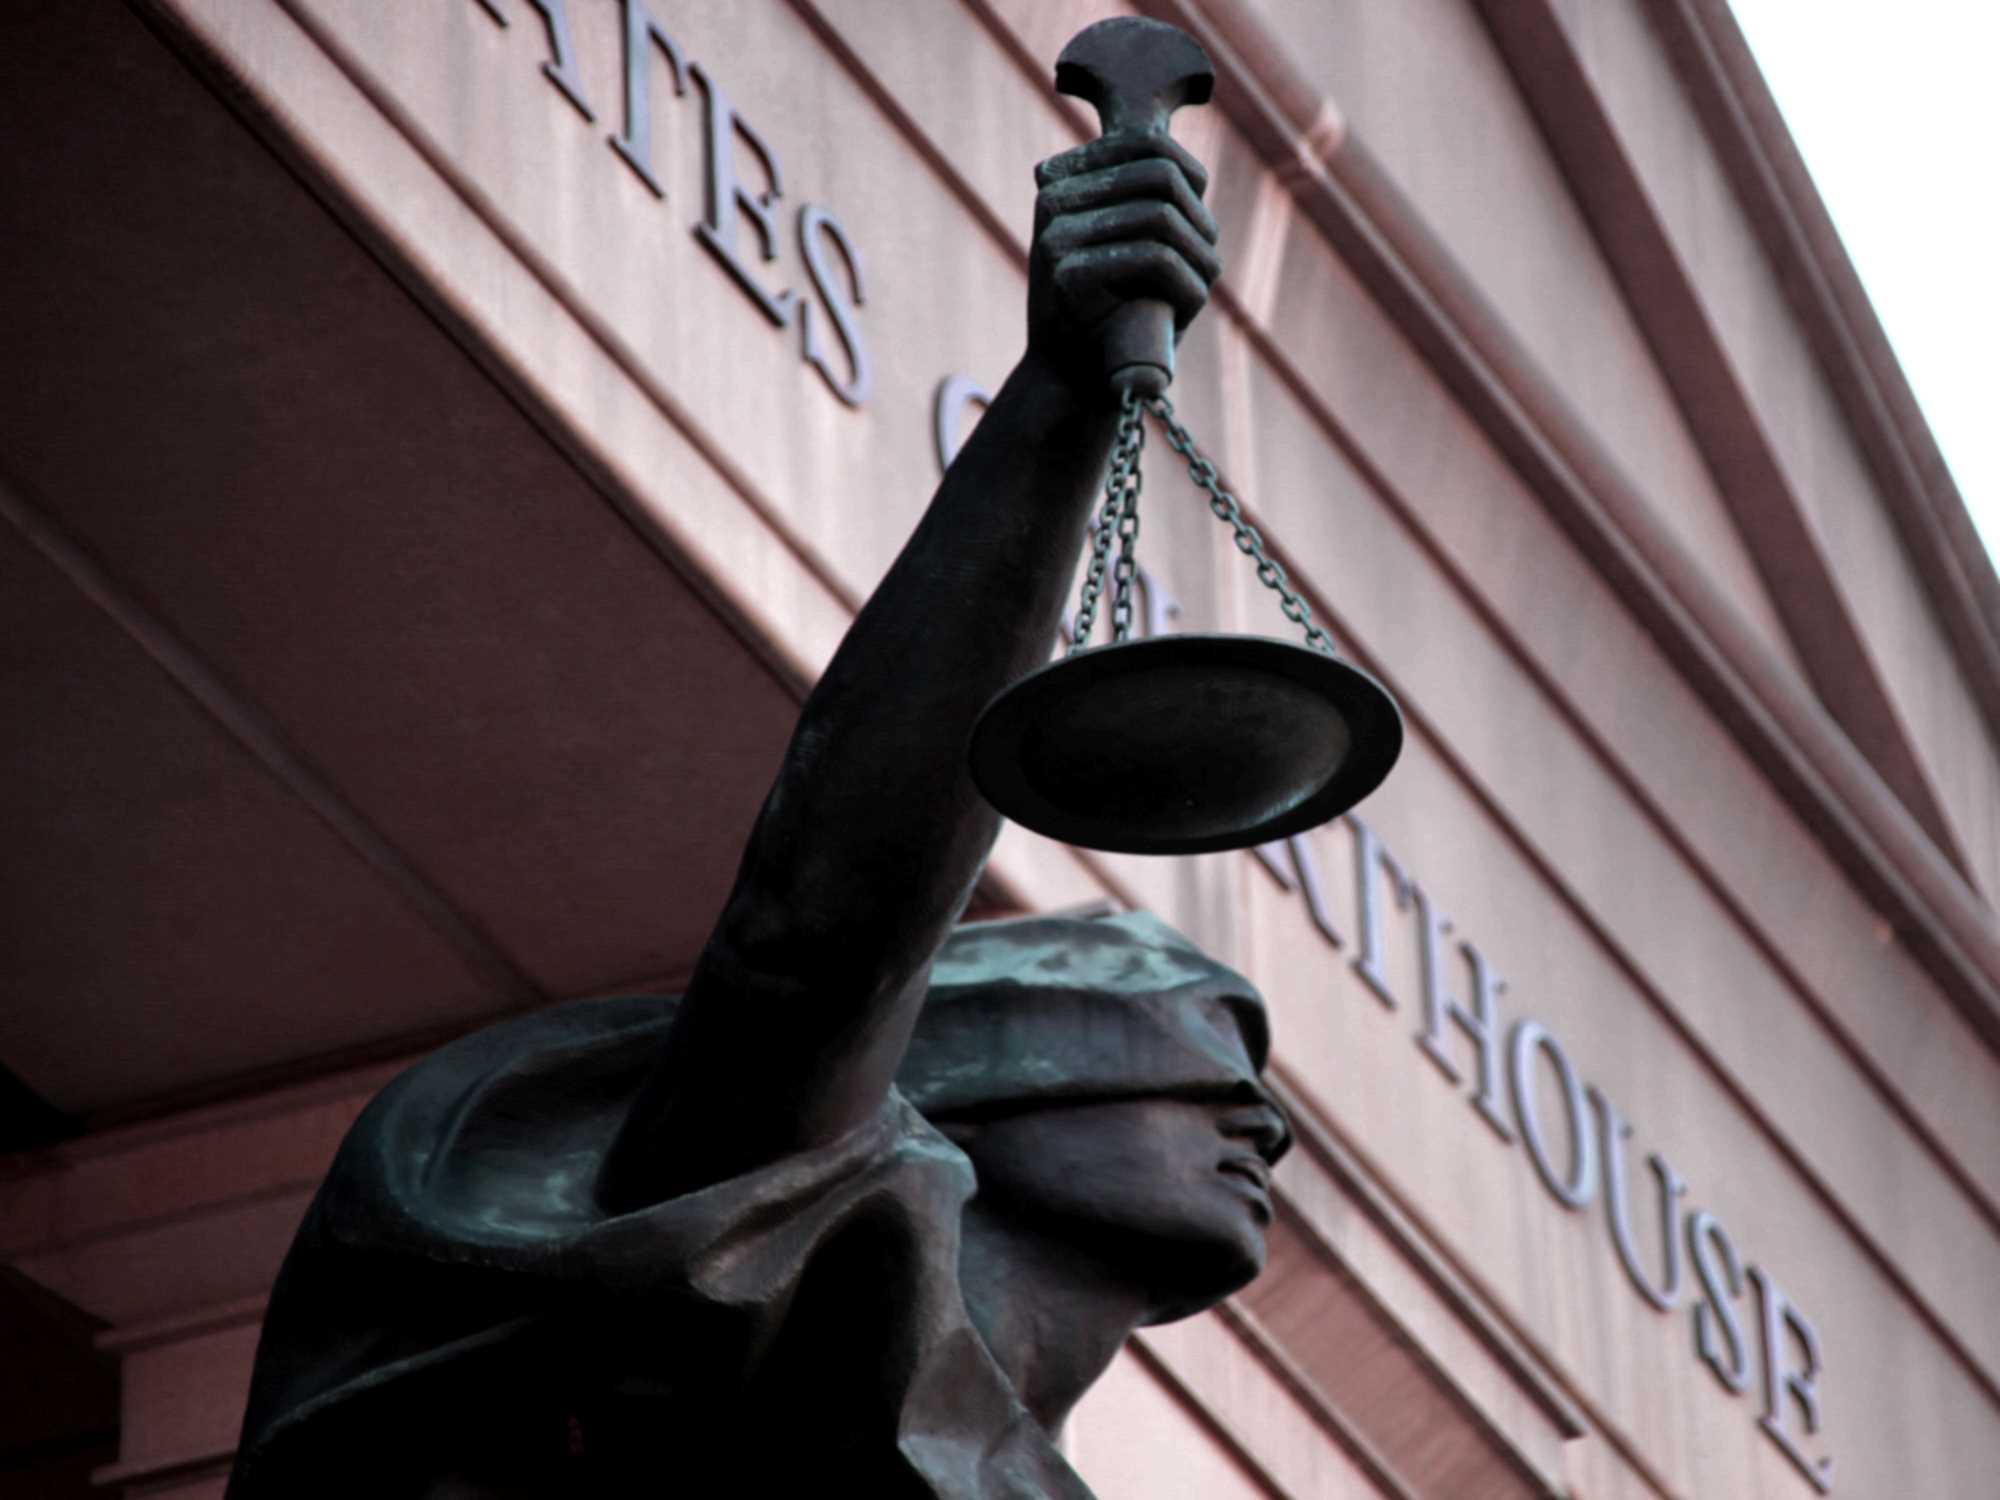 2015-12-18 justice from tim evanson ctu periti esperti del tribunale